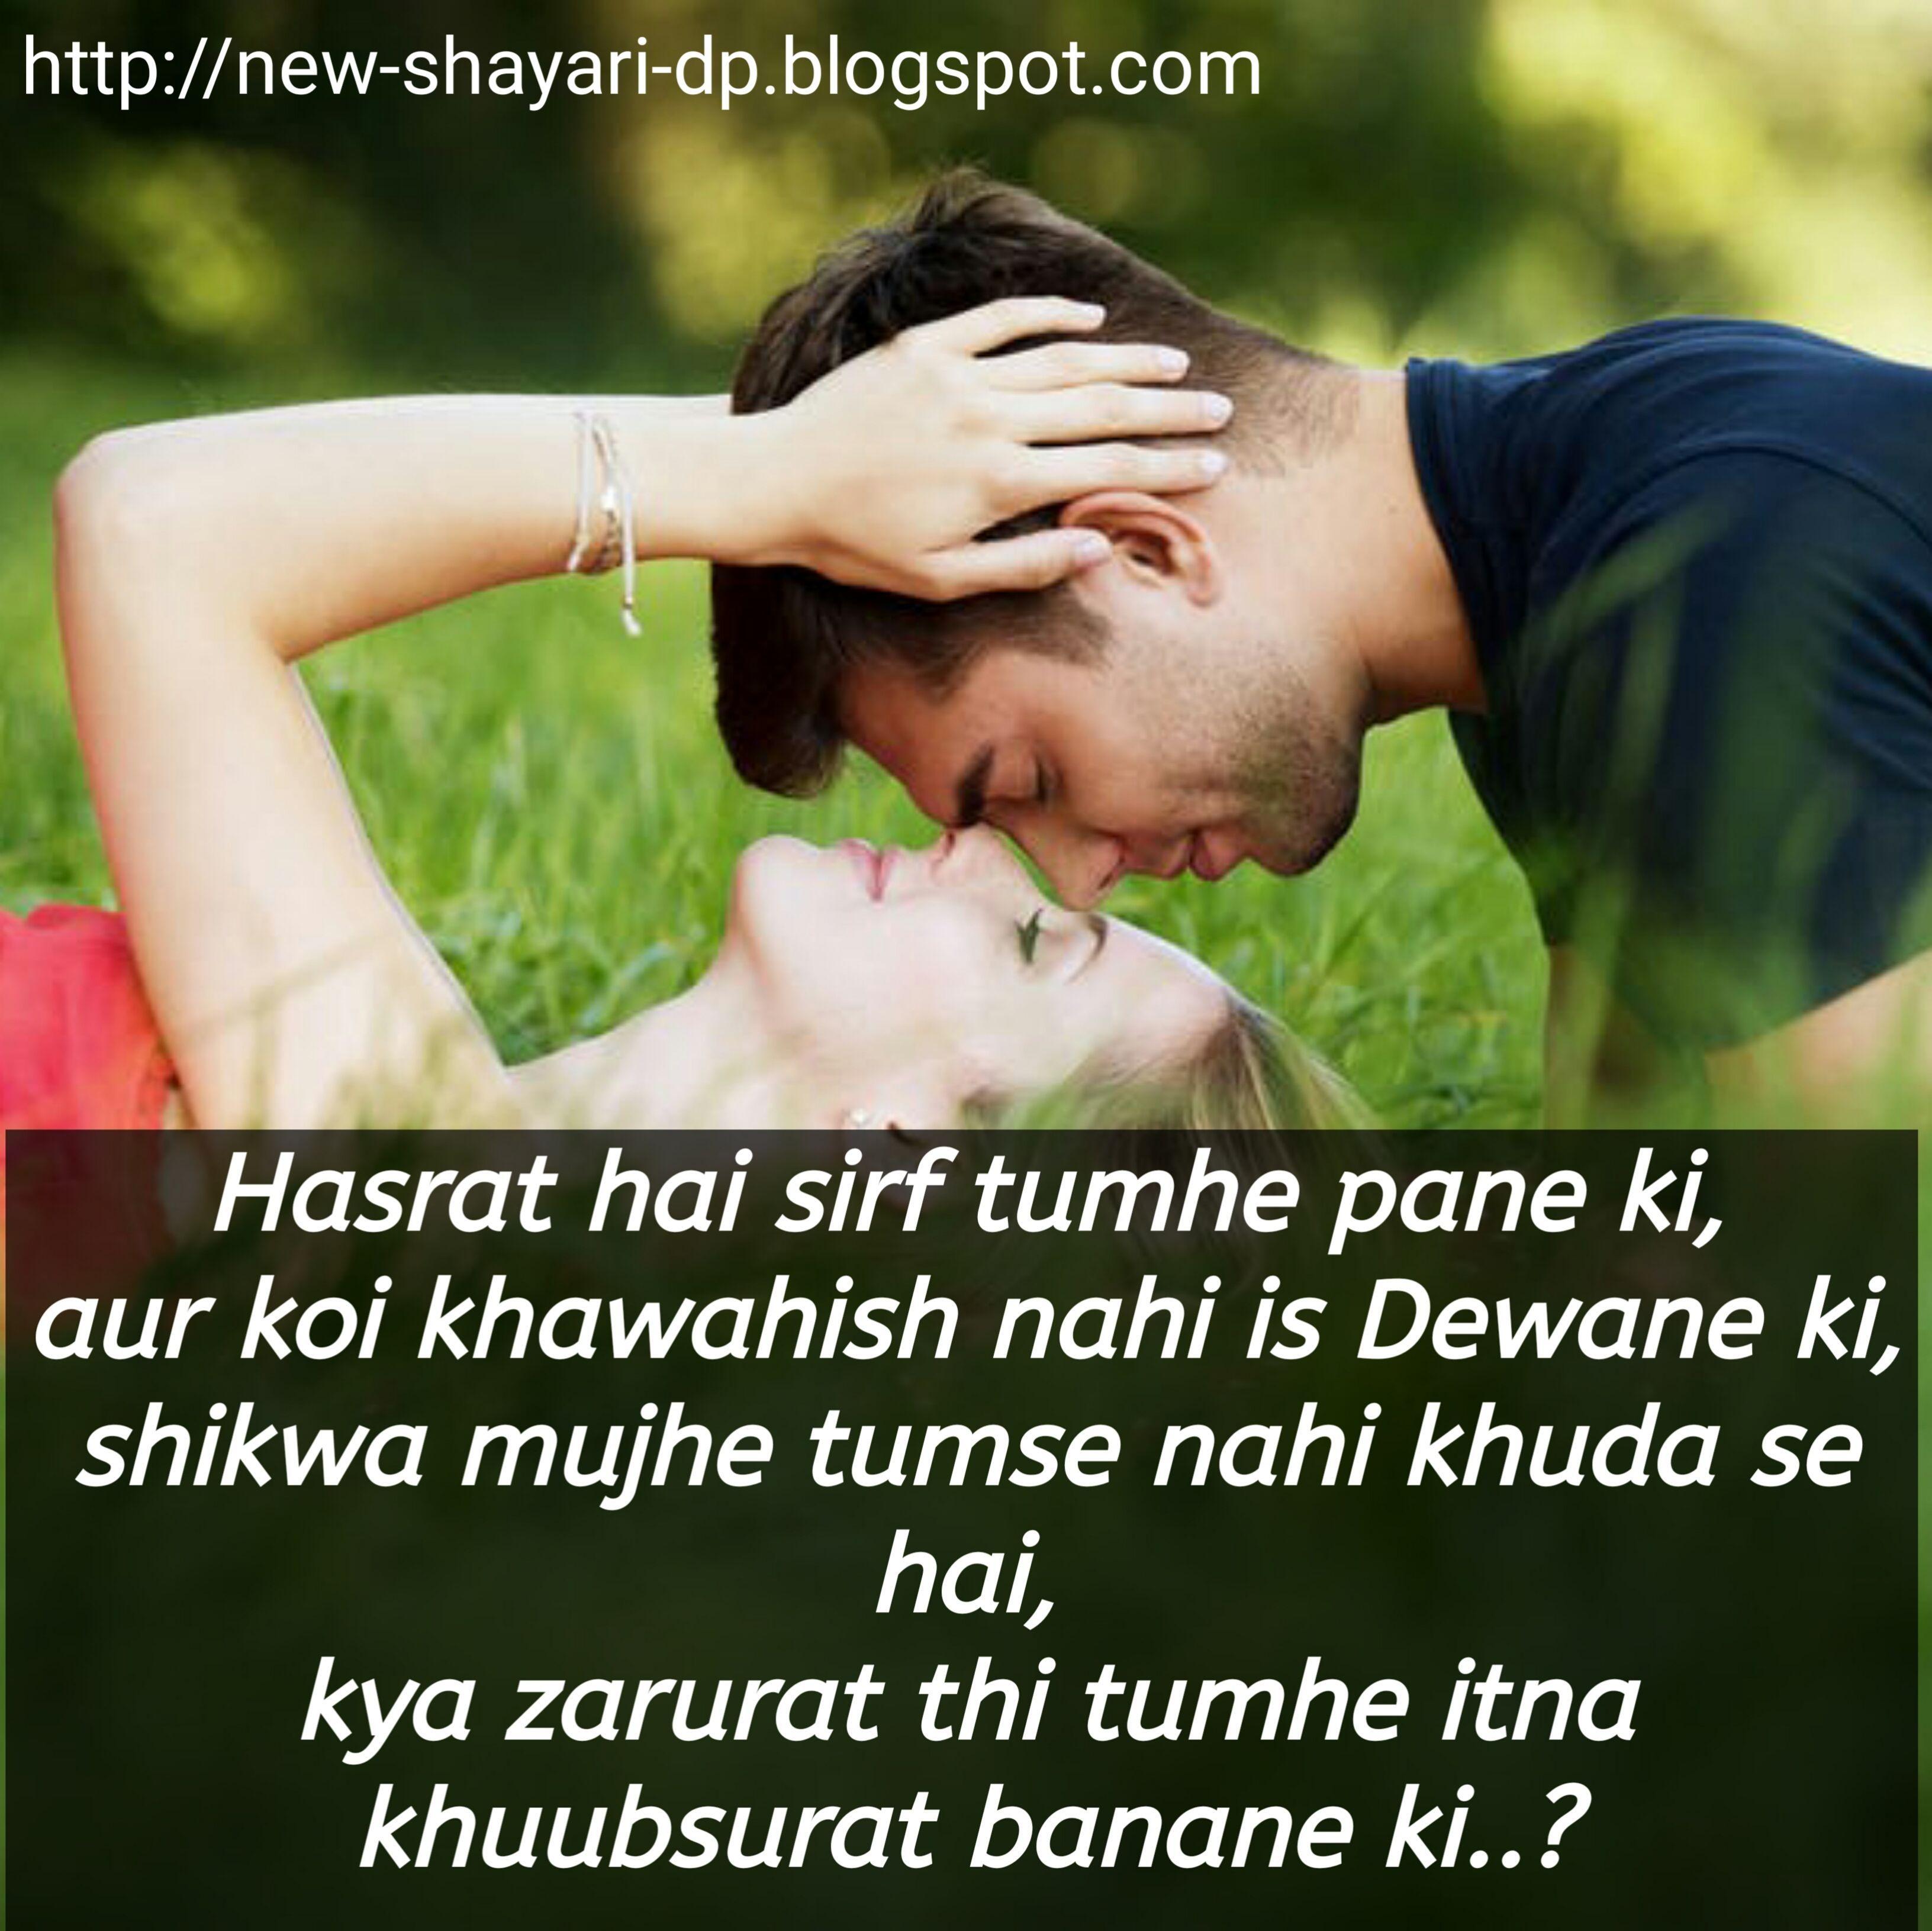 50love Shayari Image Hindi English Love Shayari With Photo Love Shayari Whatsapp Dp Love Quotes For Her Romantic Love Quotes Romantic Quotes For Girlfriend